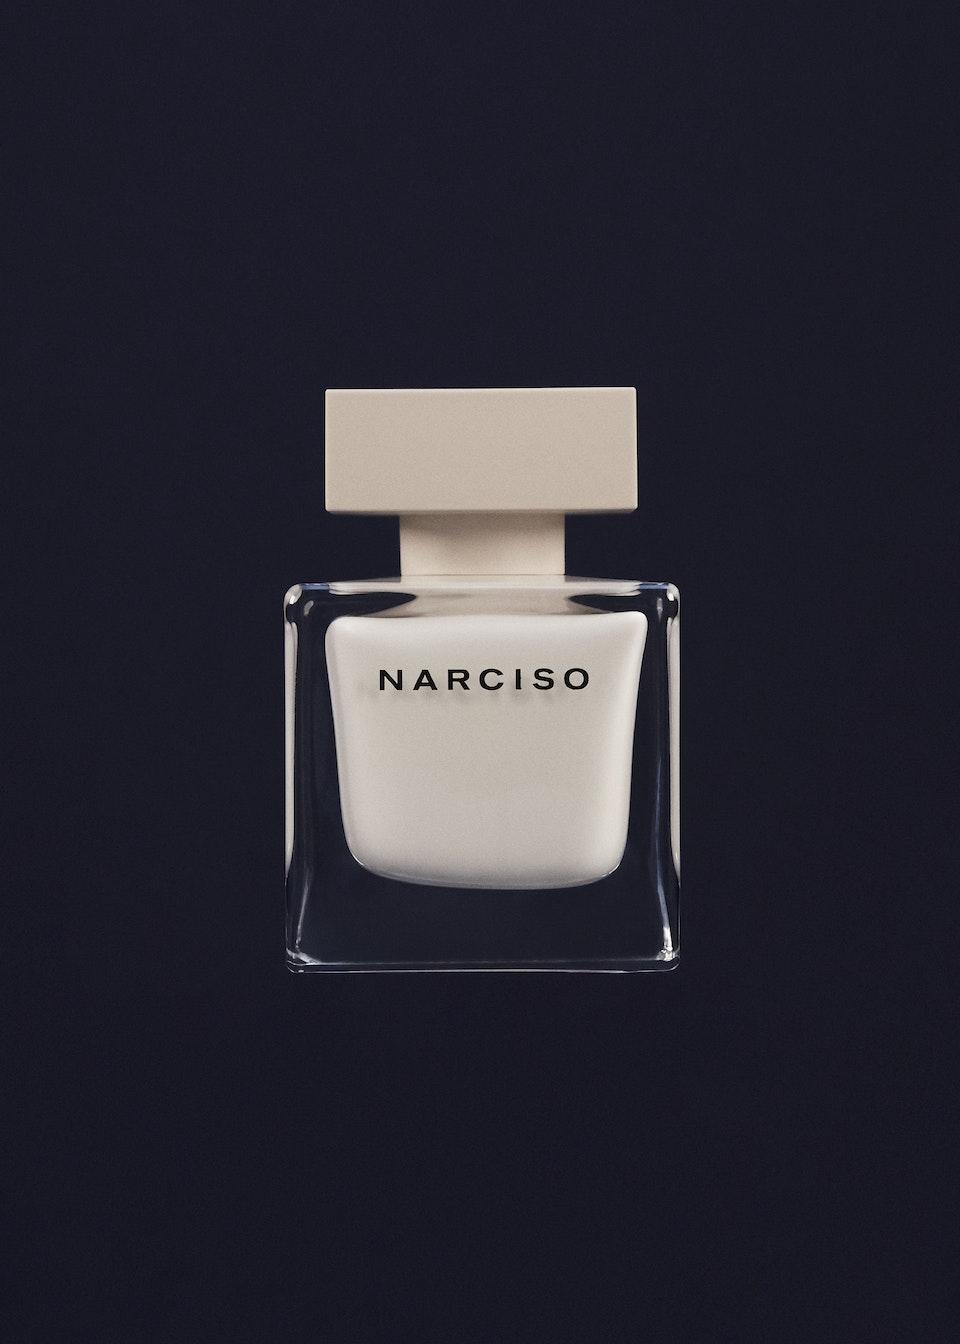 Narciso Rodriguez Perfume - Stills BLOOM_NARCISO_PARFUM_1